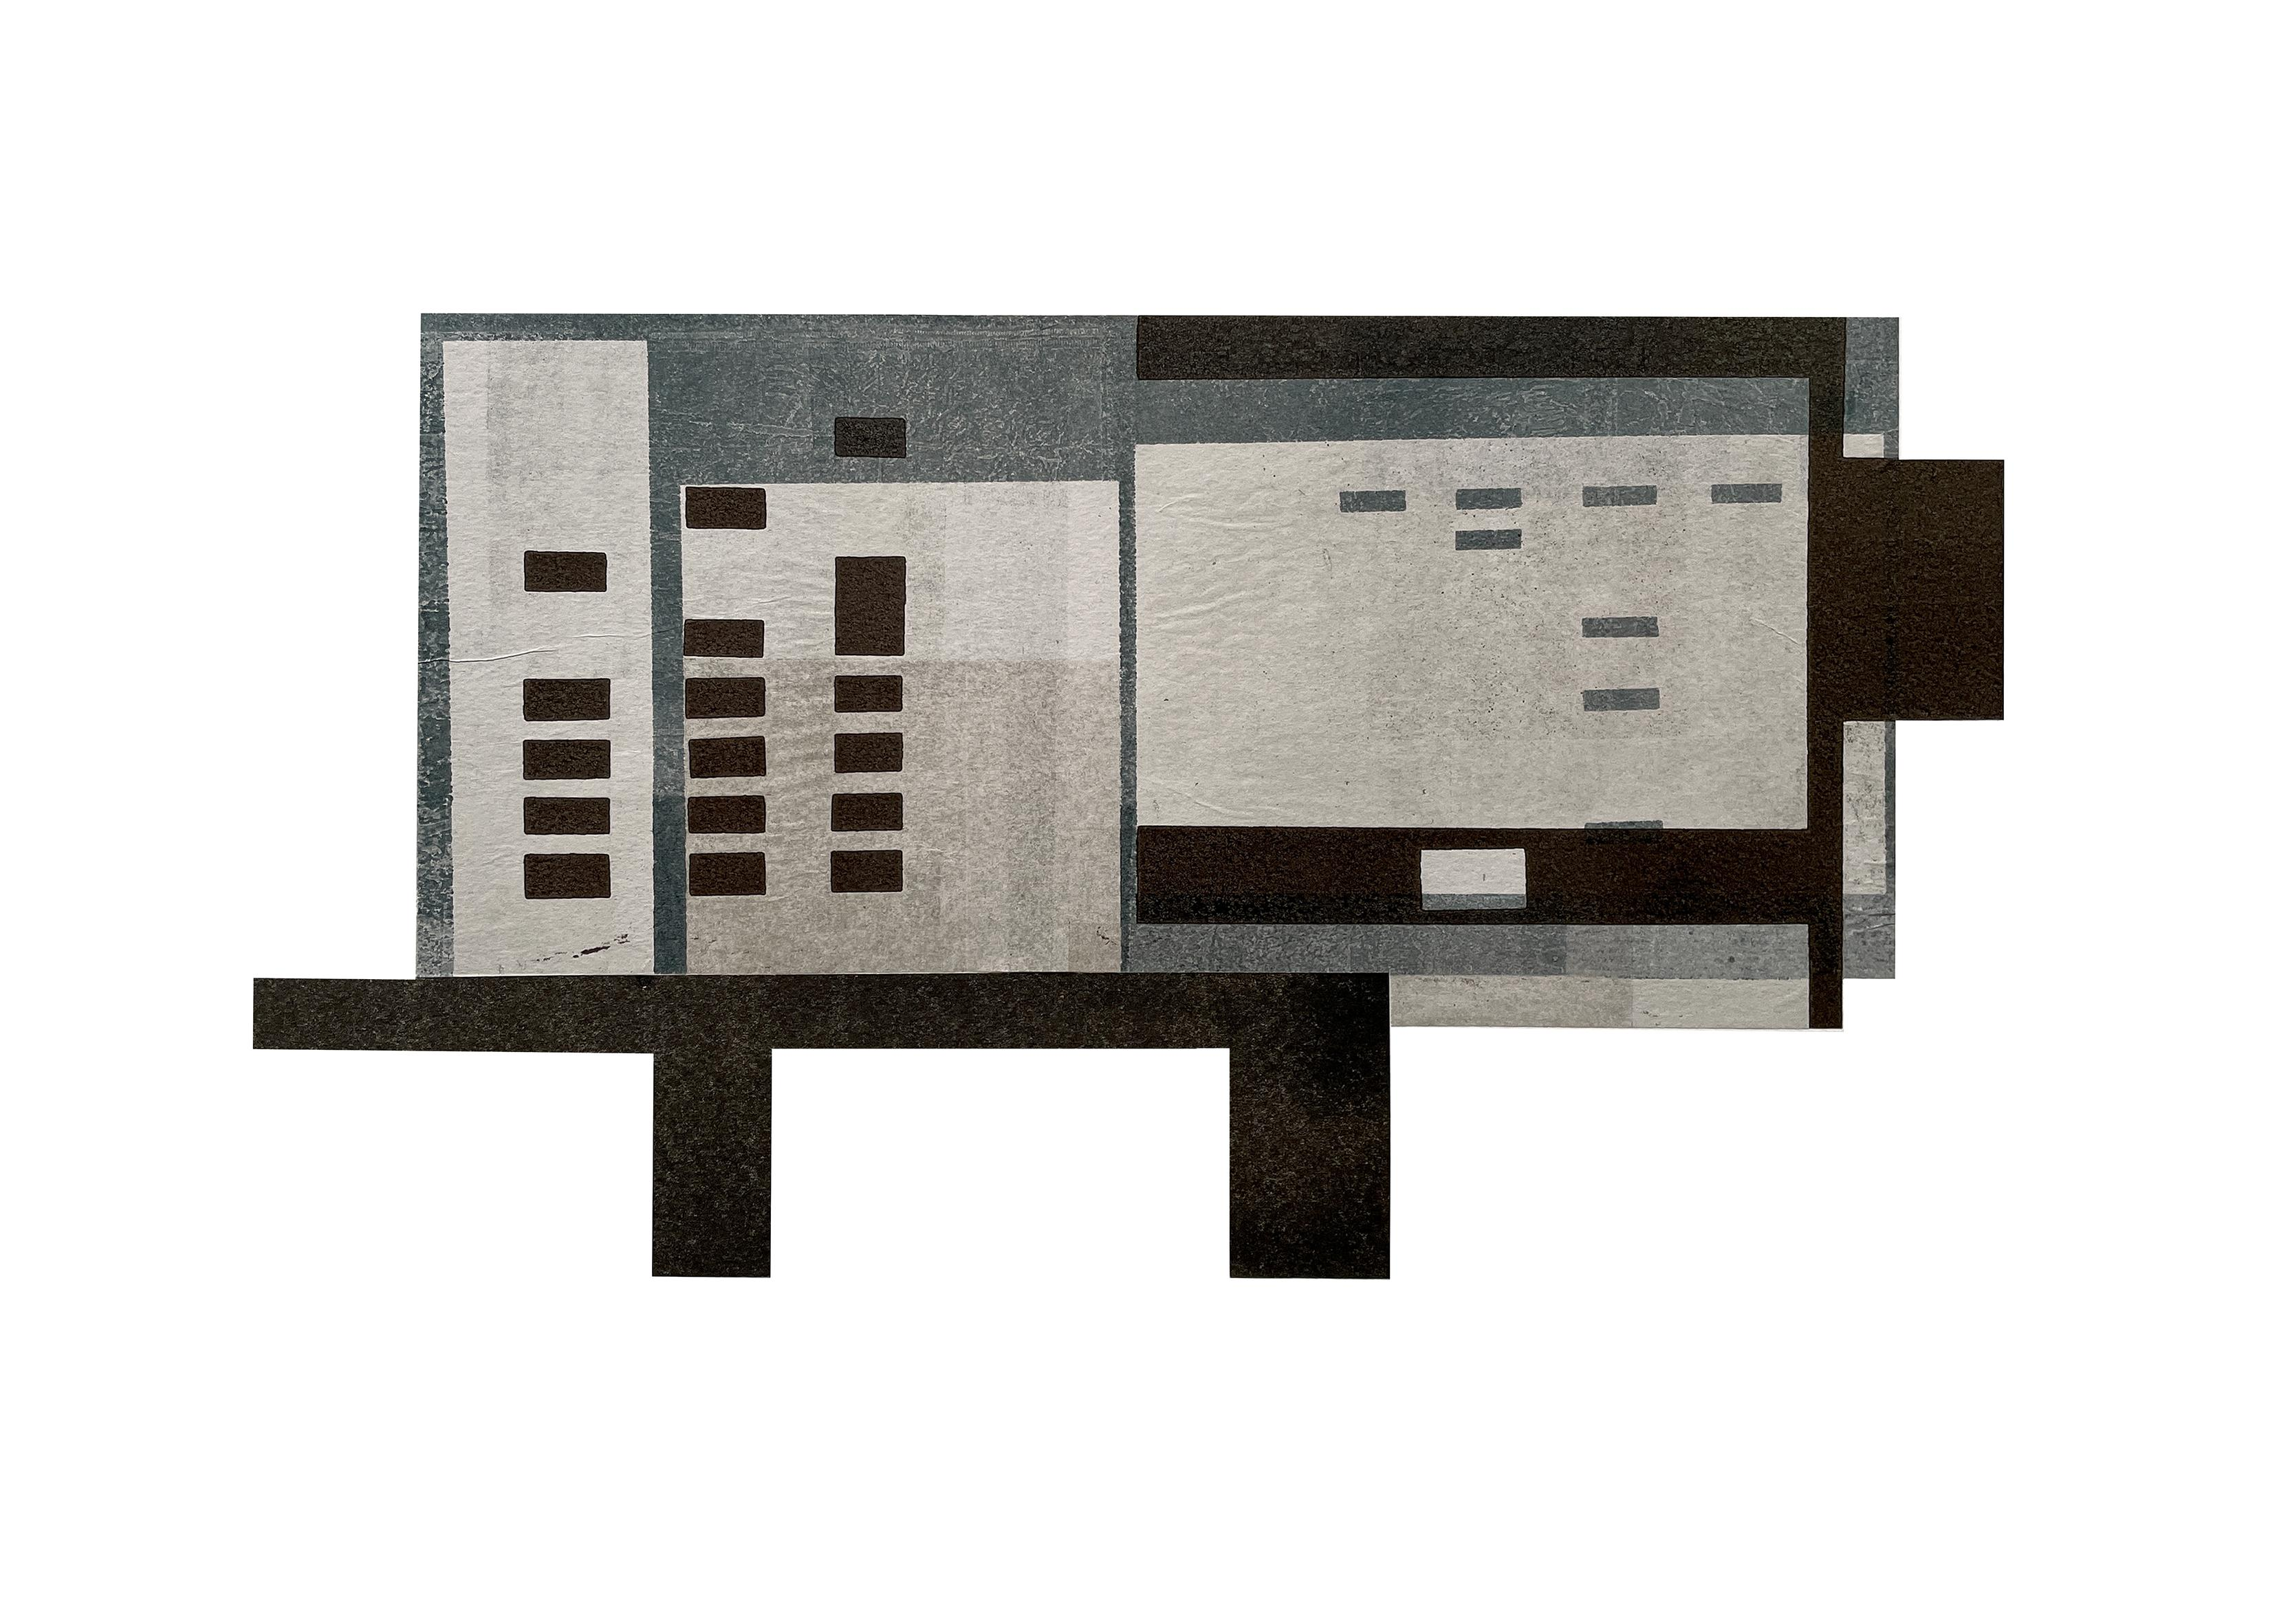 Cabin I: modernist, urban architectural monoprint & collage in gray, blue, black